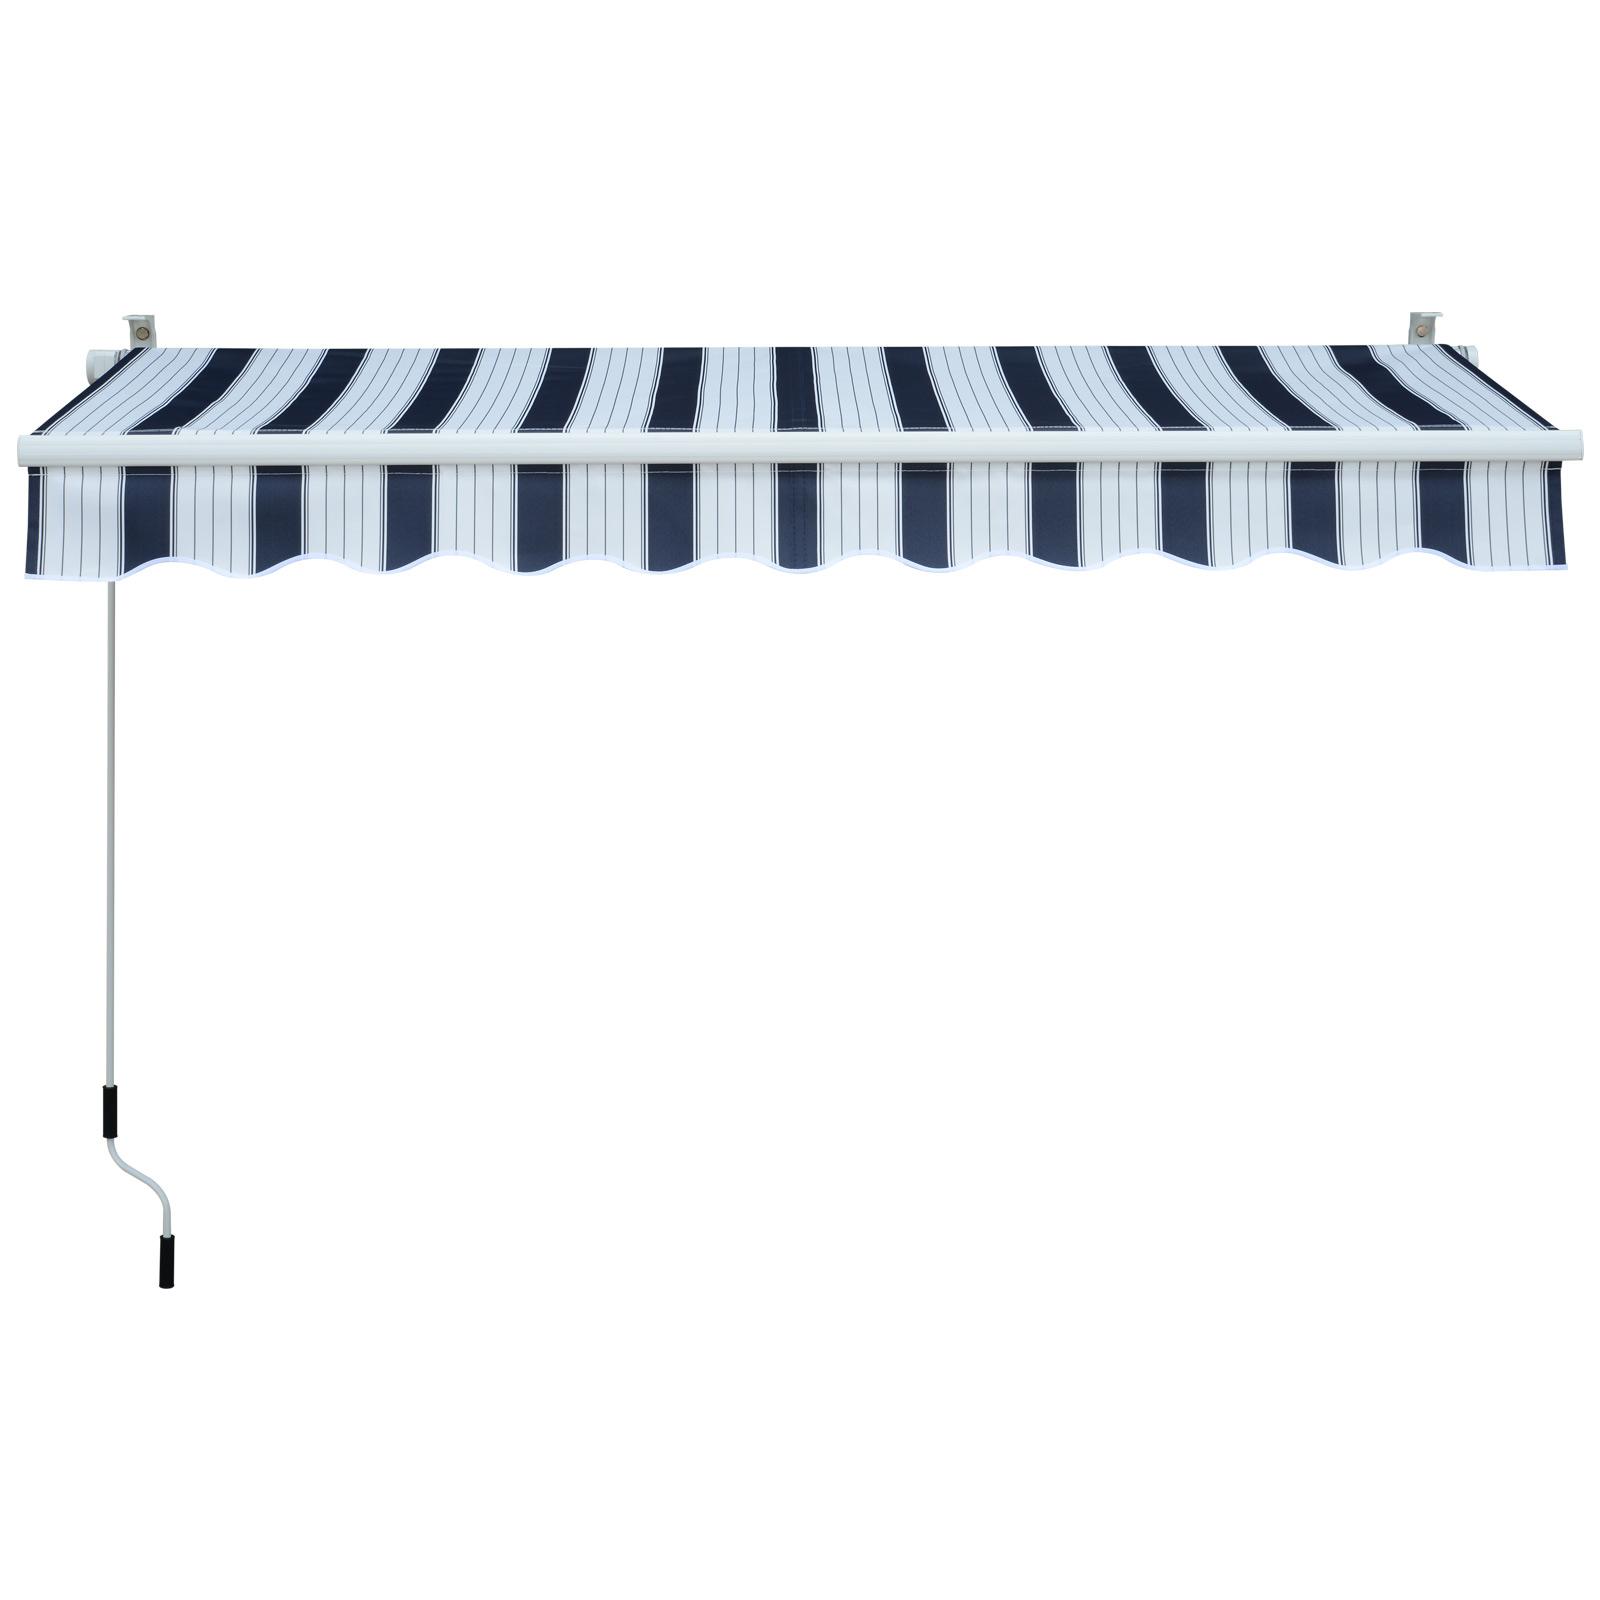 Garden-Patio-Manual-Awning-Canopy-Sun-Shade-Shelter-Retractable-4-Size-5-Colour thumbnail 4